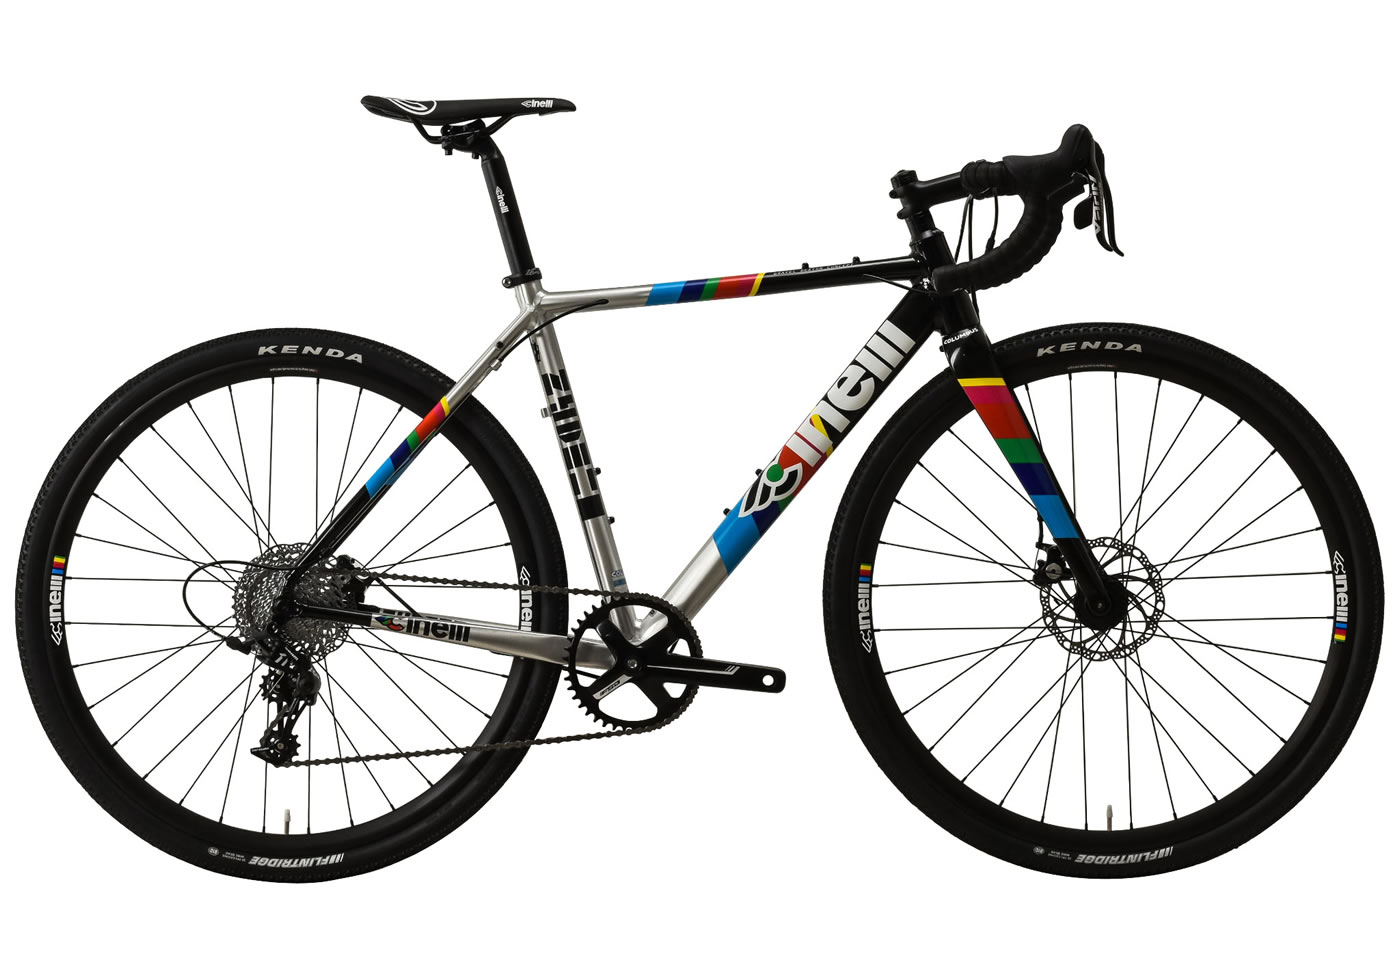 Bicicleta gravel cinelli zydeco sram apex